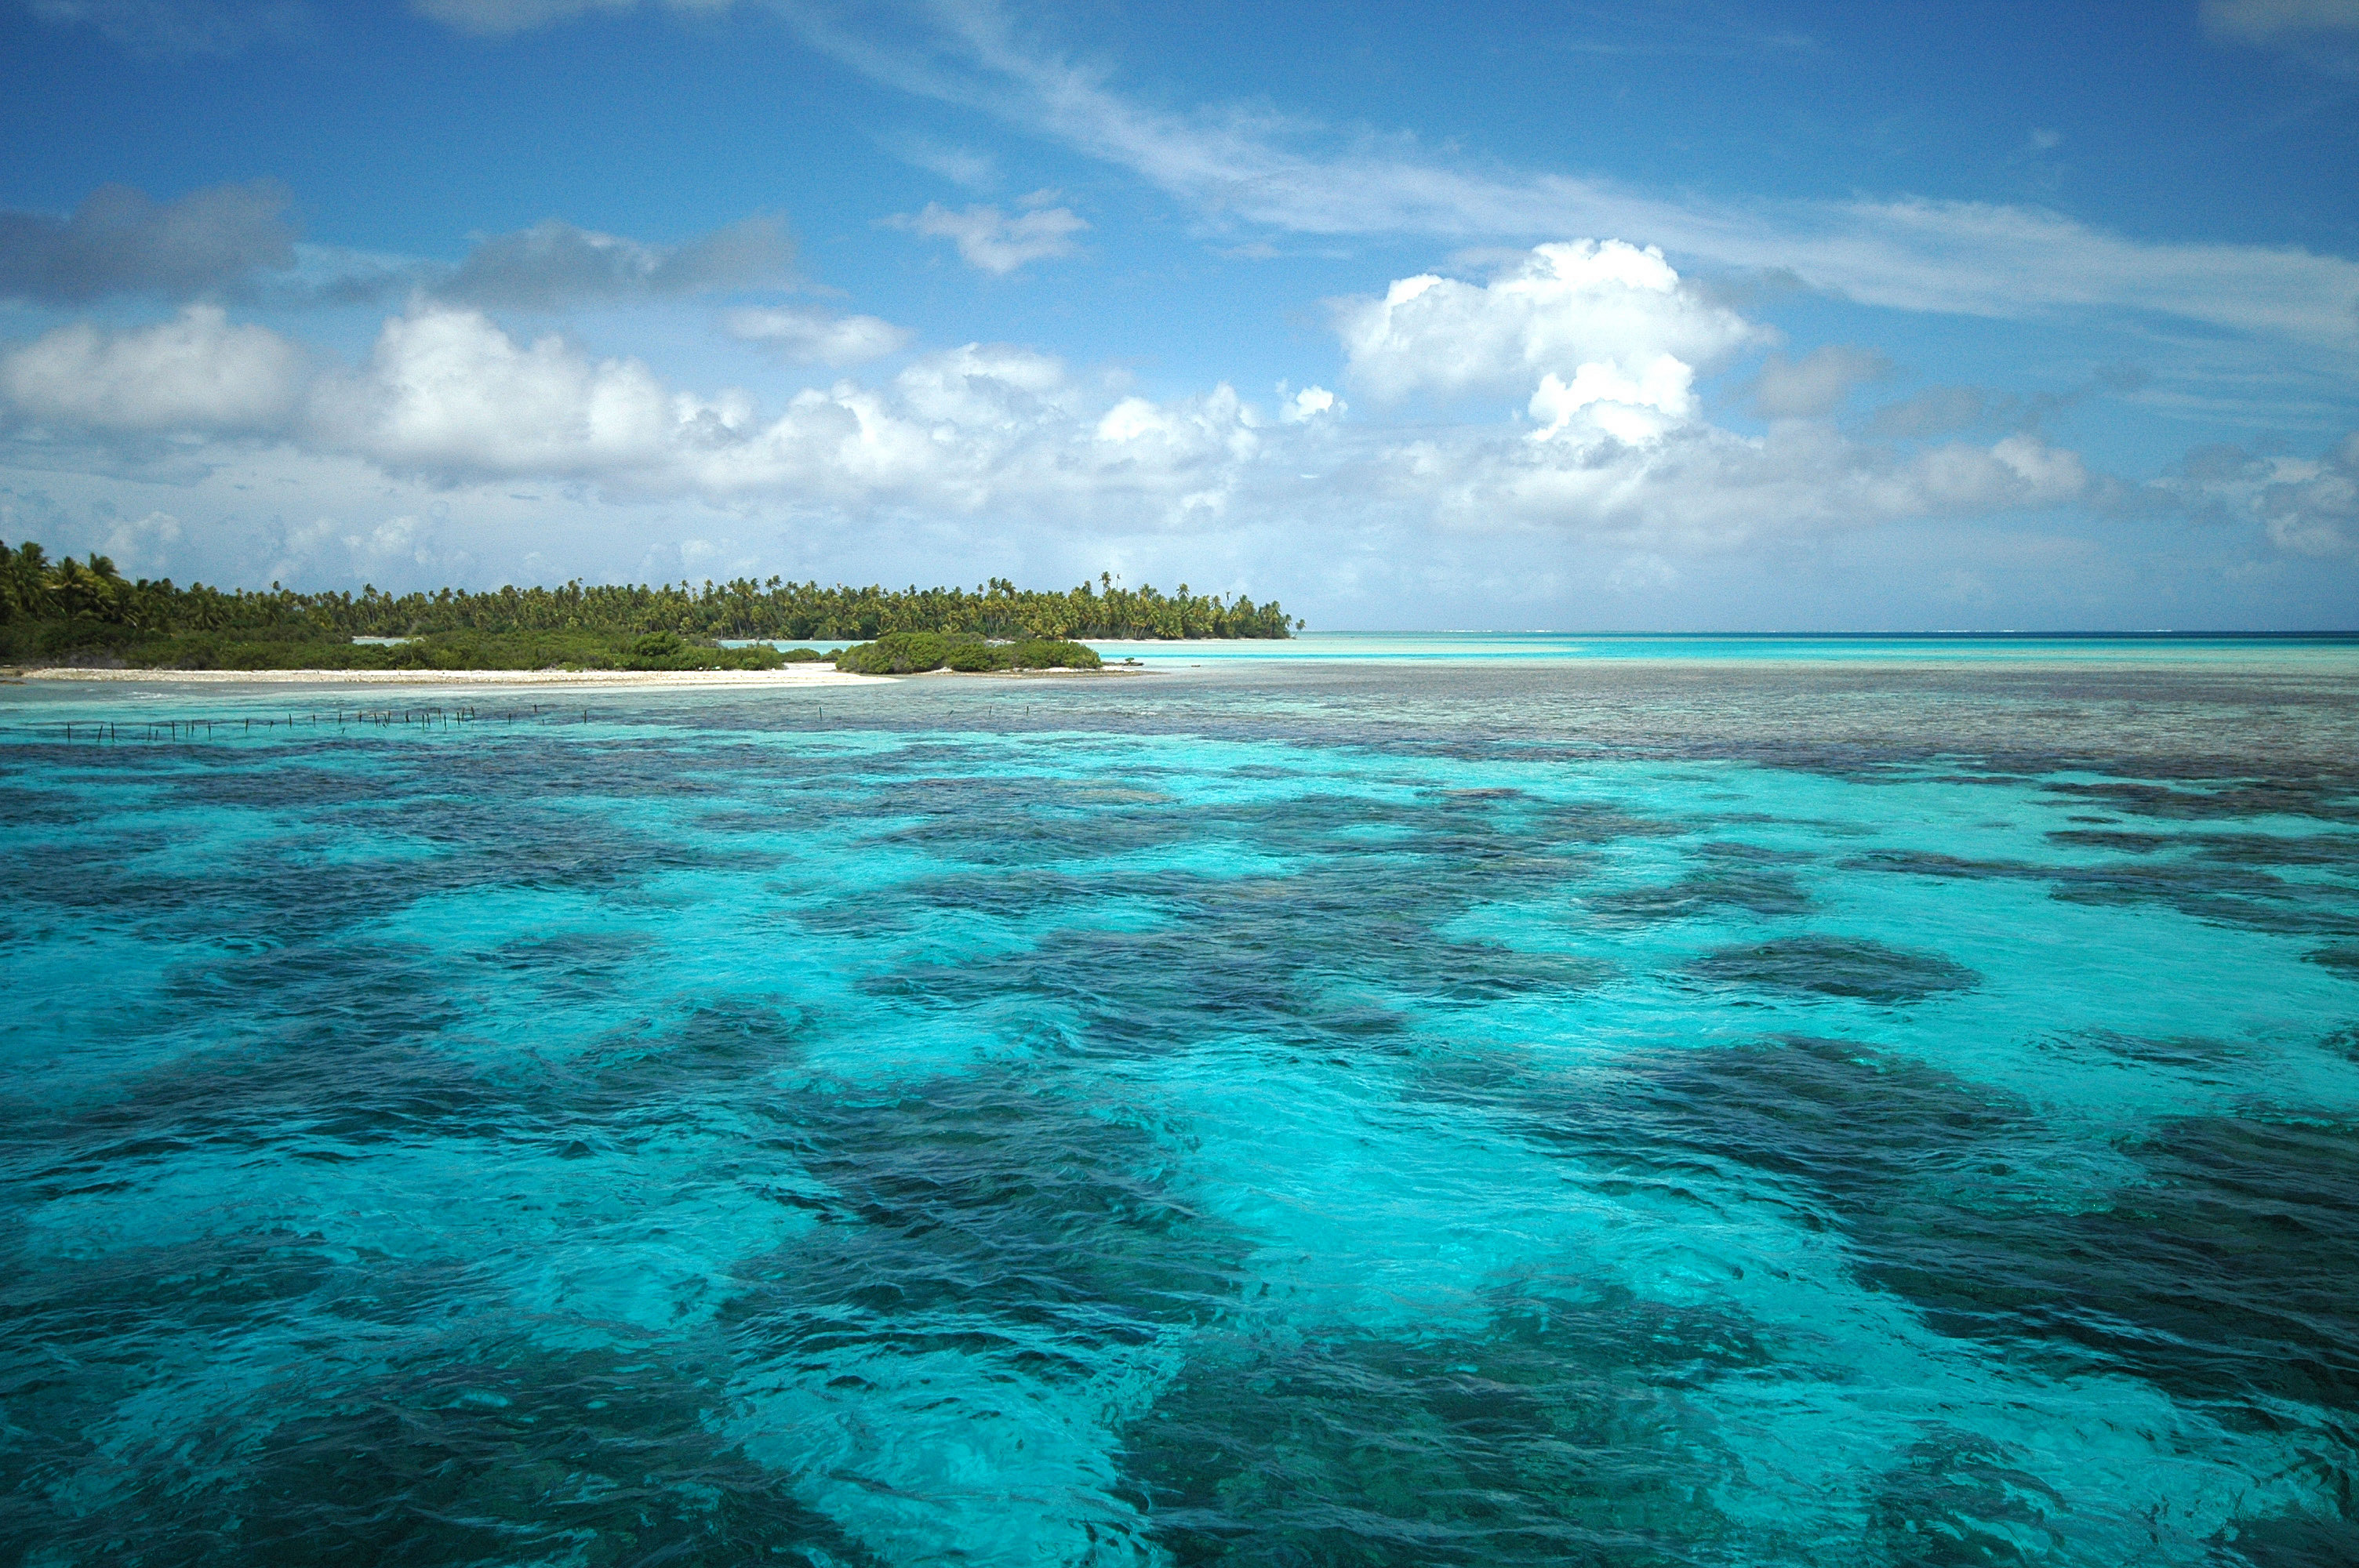 Tourisme insulaire durable